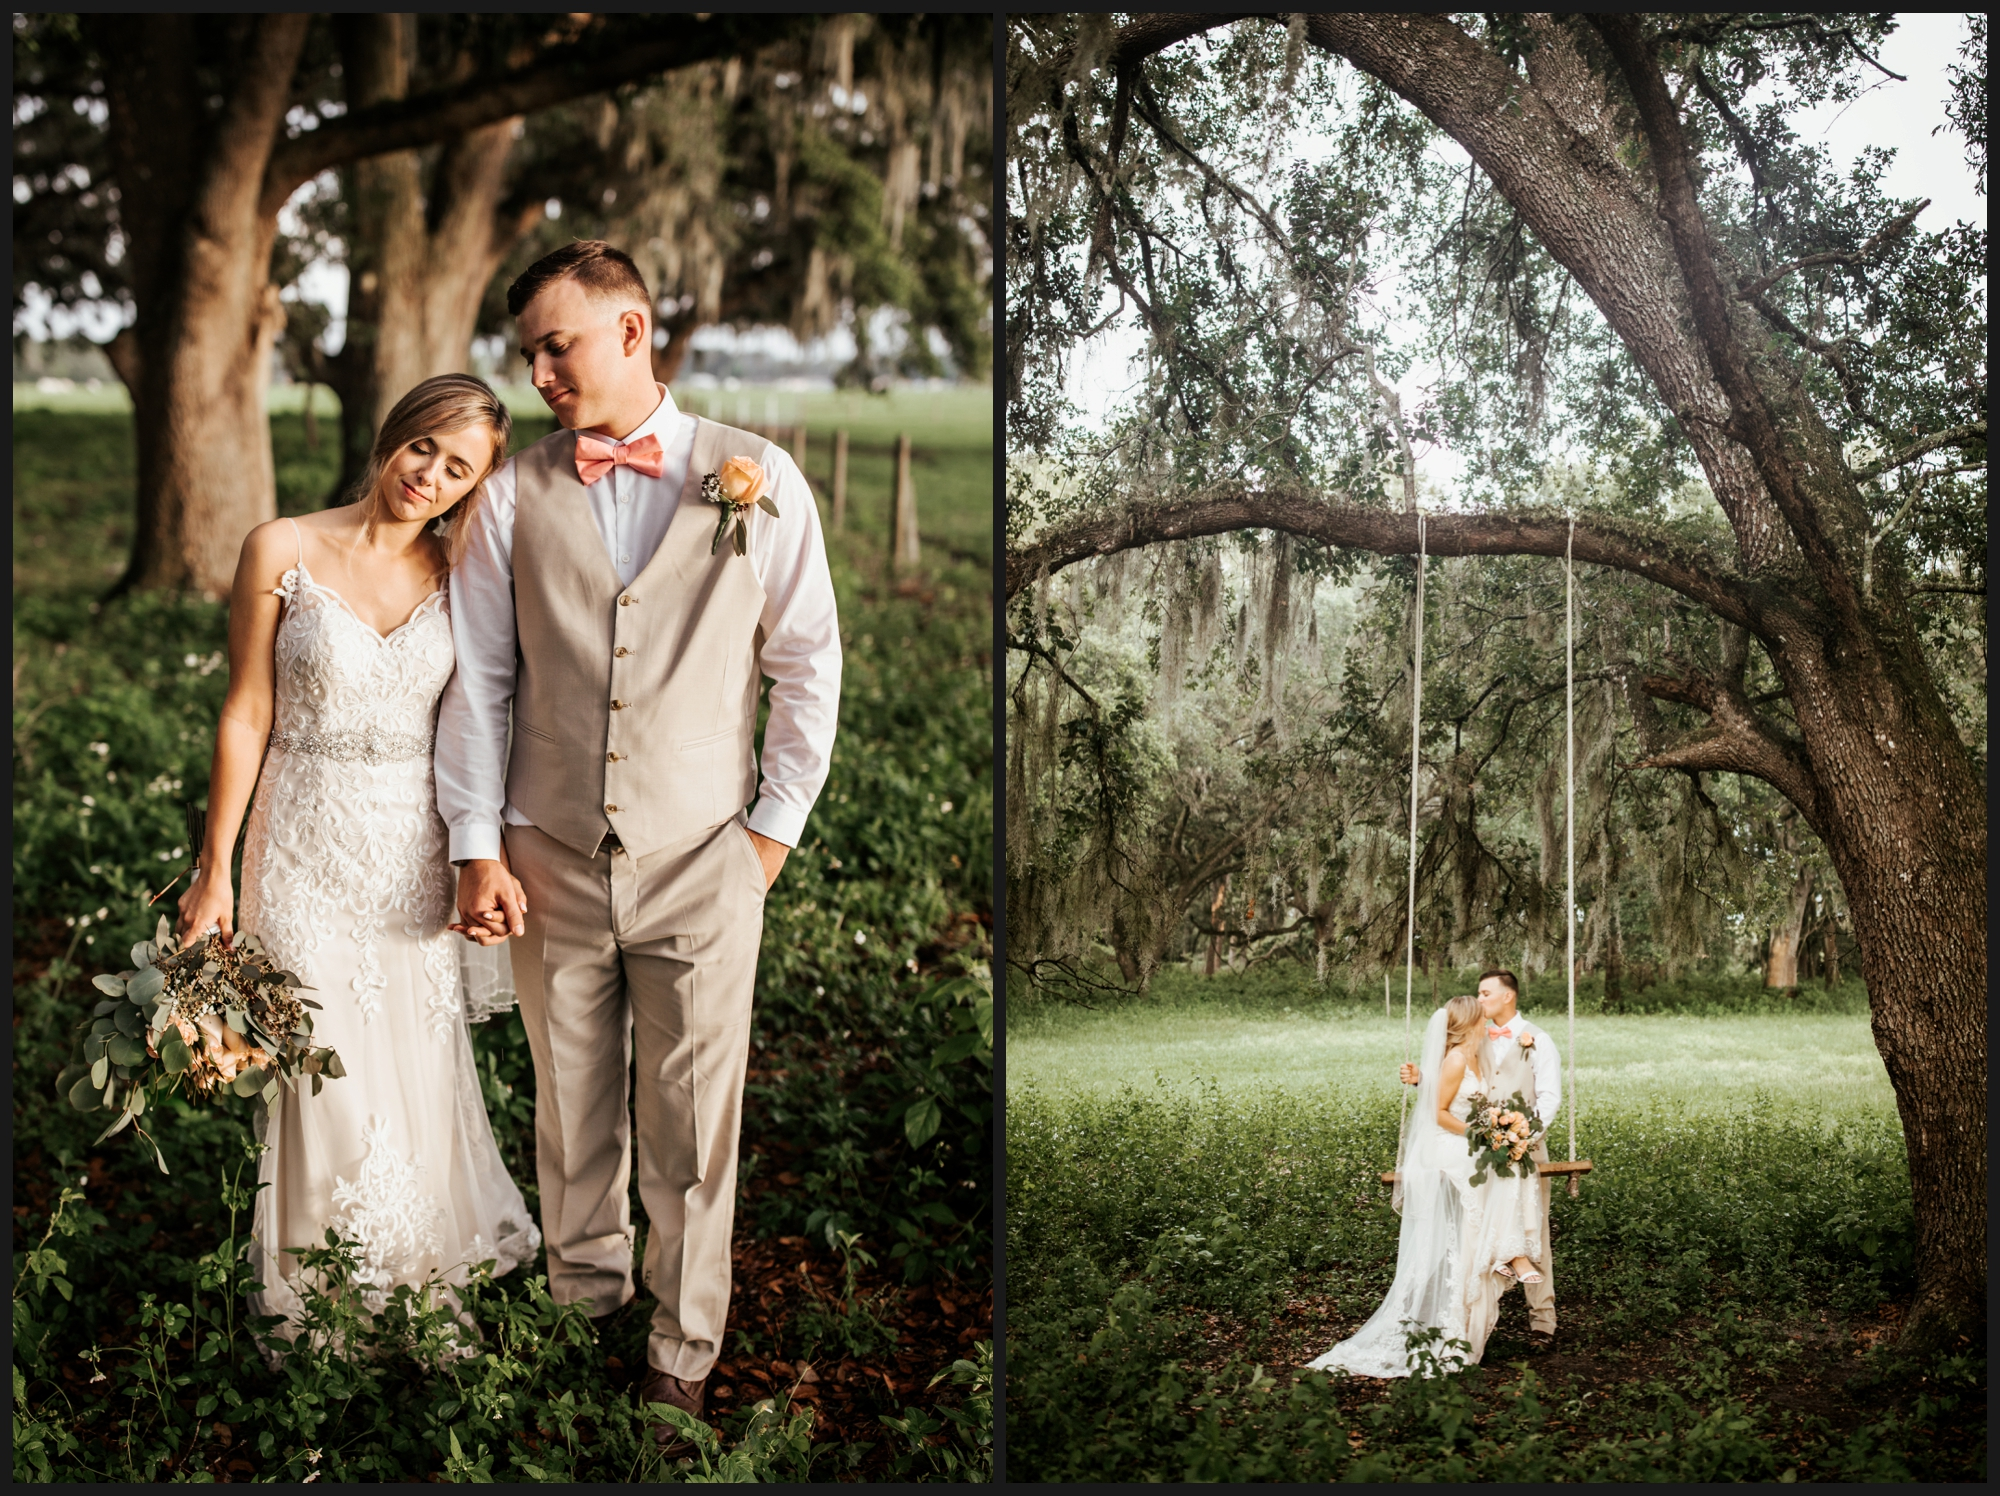 Orlando-Wedding-Photographer-destination-wedding-photographer-florida-wedding-photographer-hawaii-wedding-photographer_0268.jpg